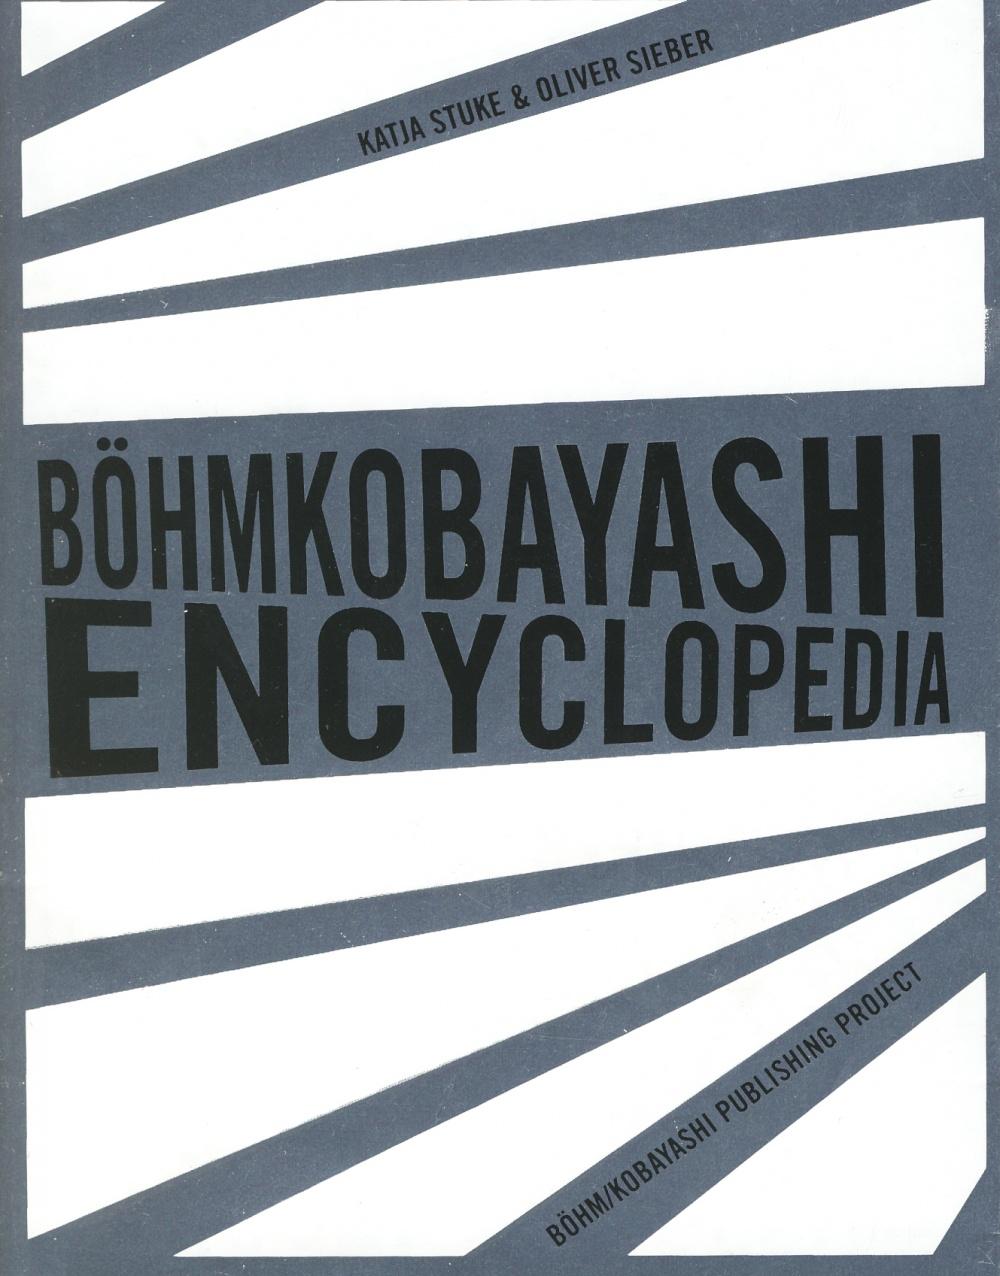 Die Böhm #37 : Böhmkobayashi Encyclopedia